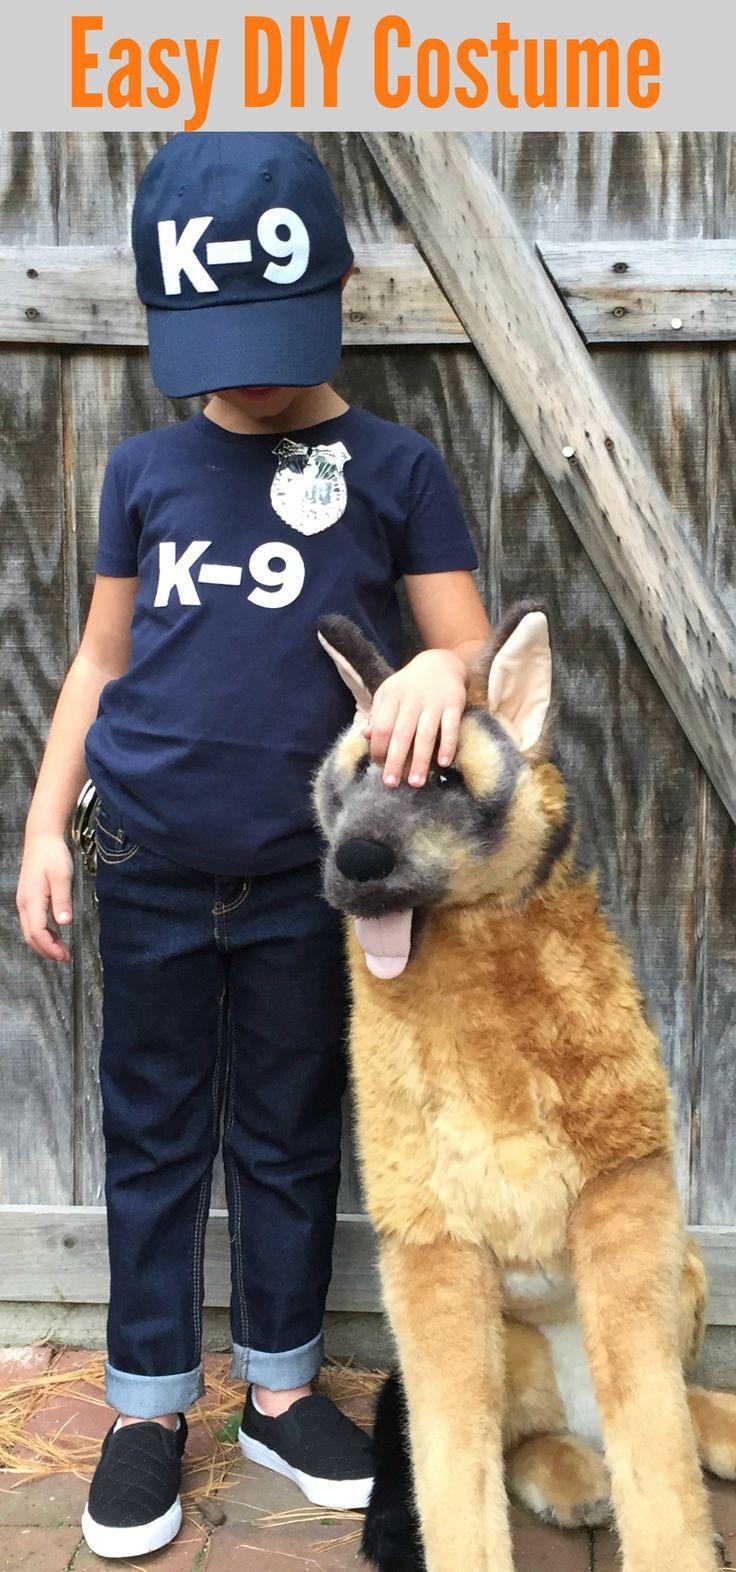 Best 25+ K9 police ideas on Pinterest | Police dogs ...